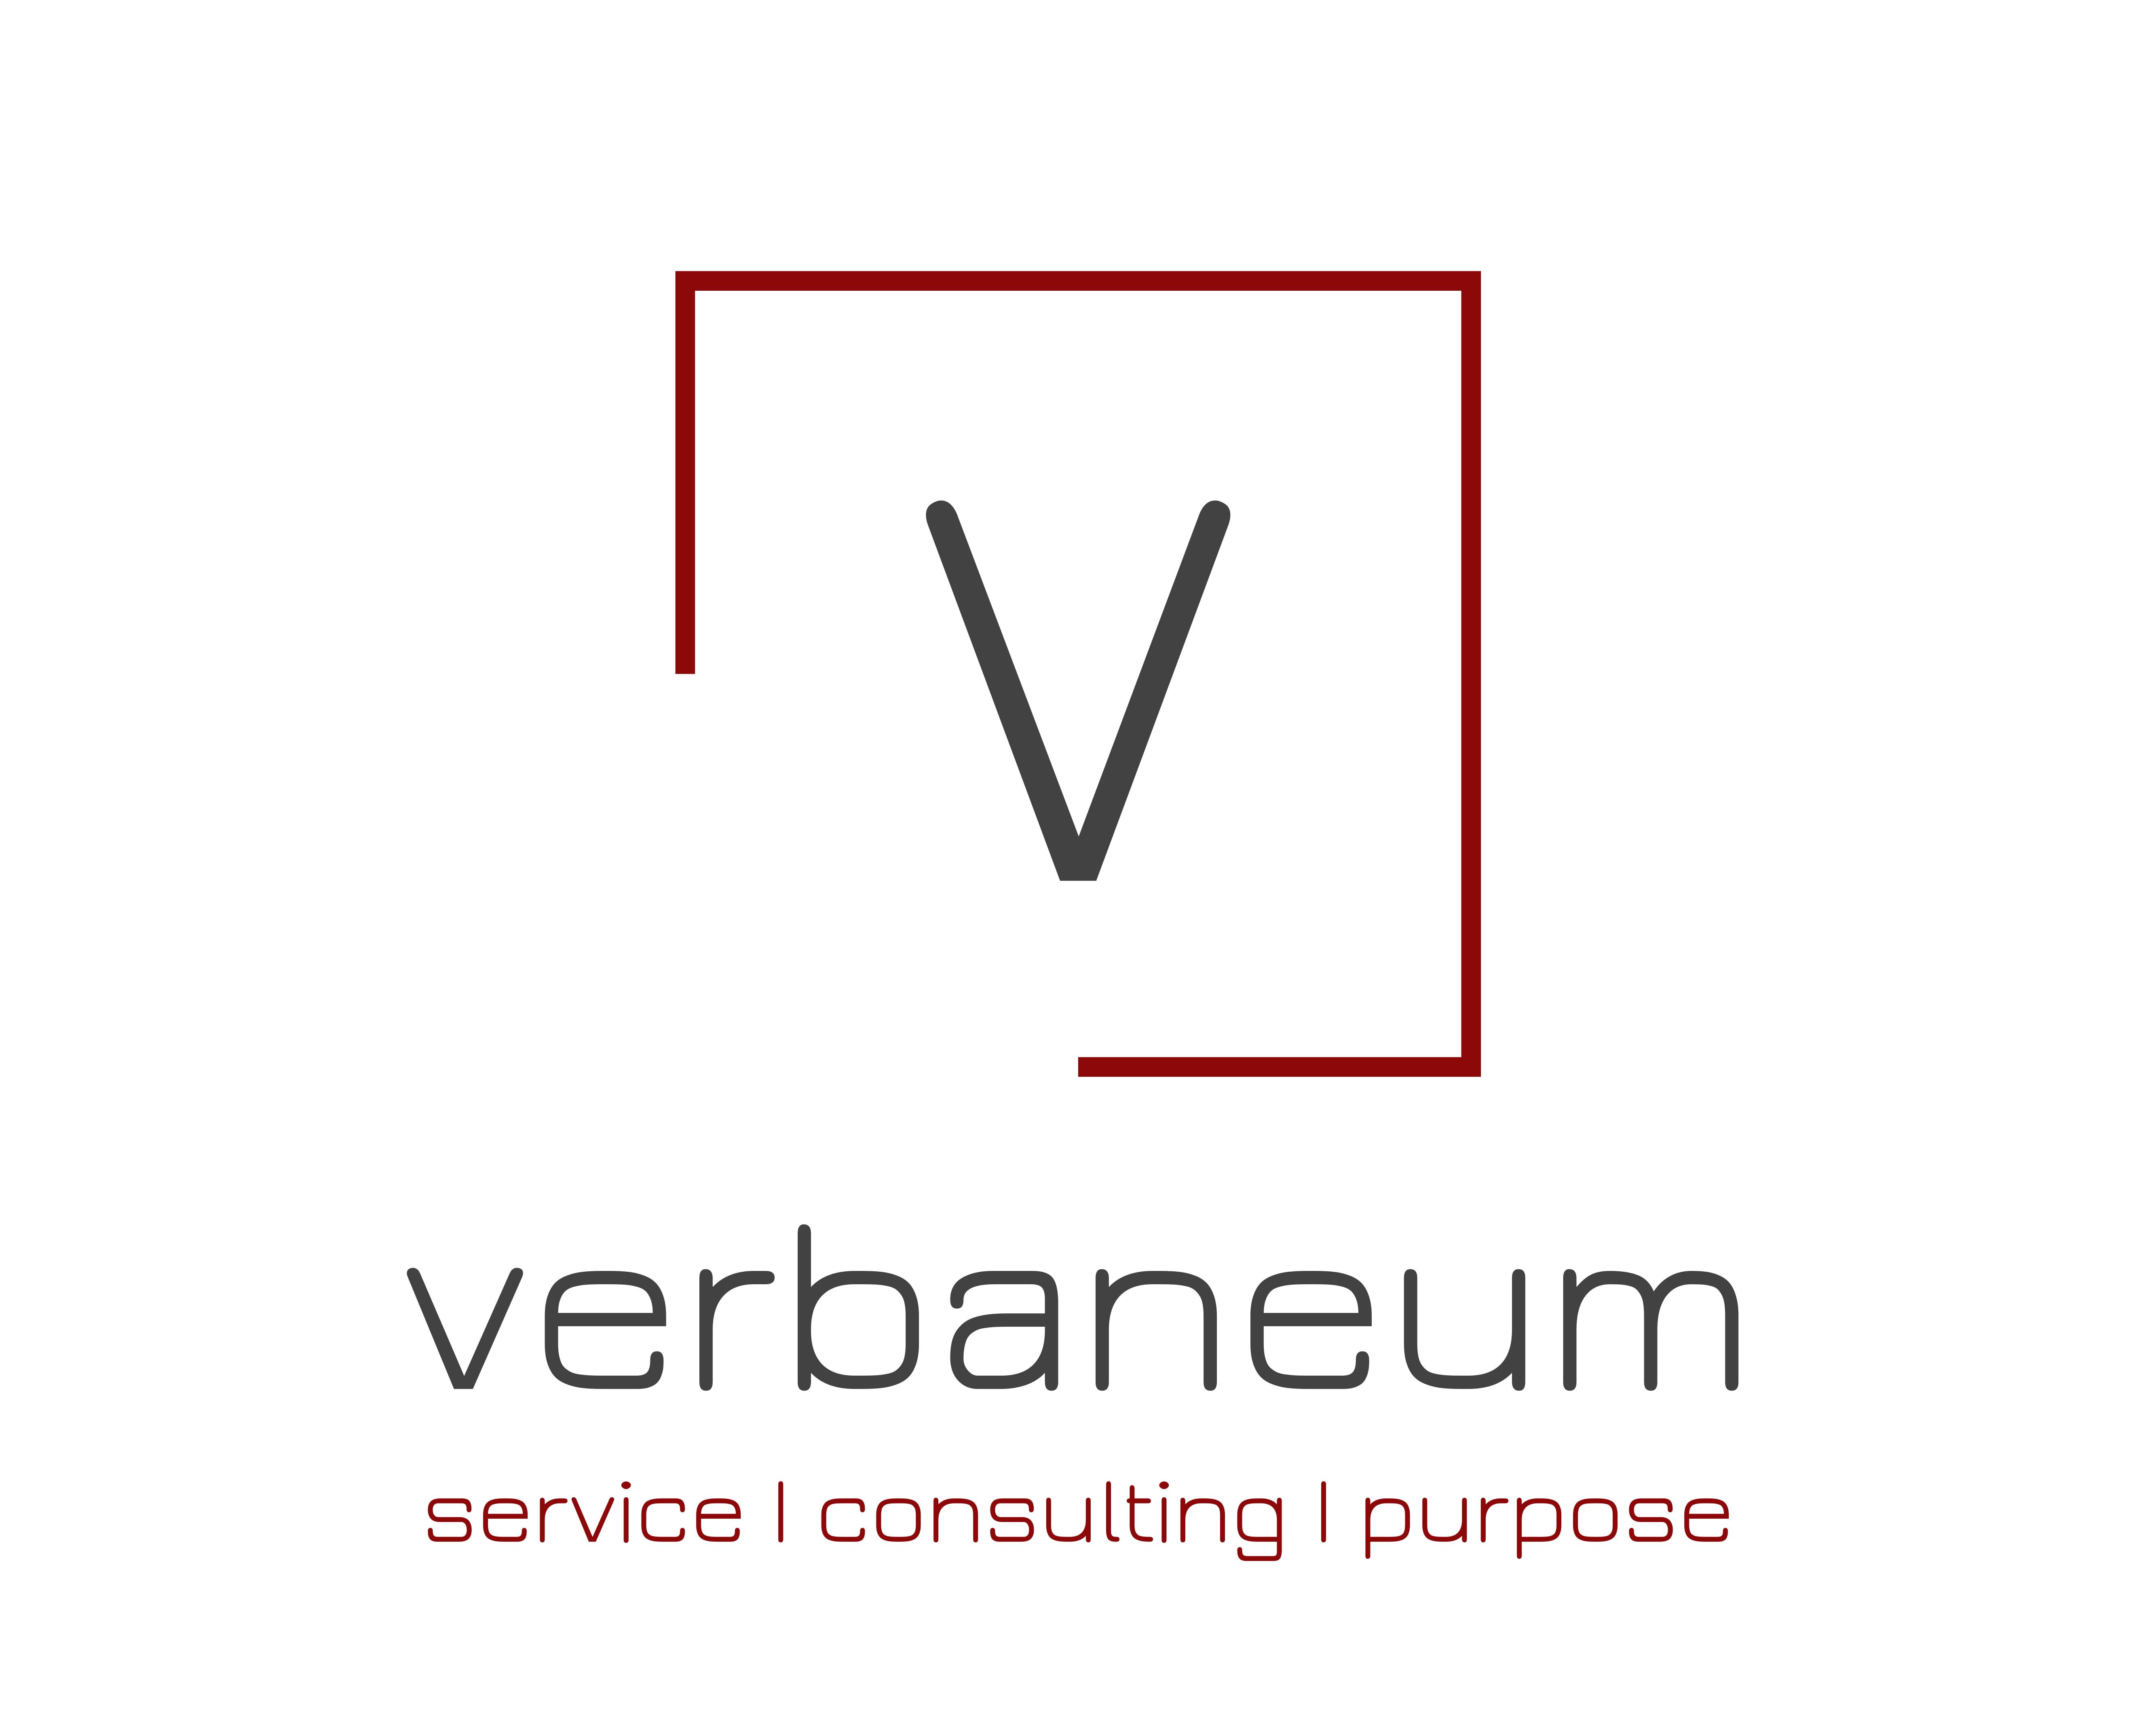 verbaneum GmbH